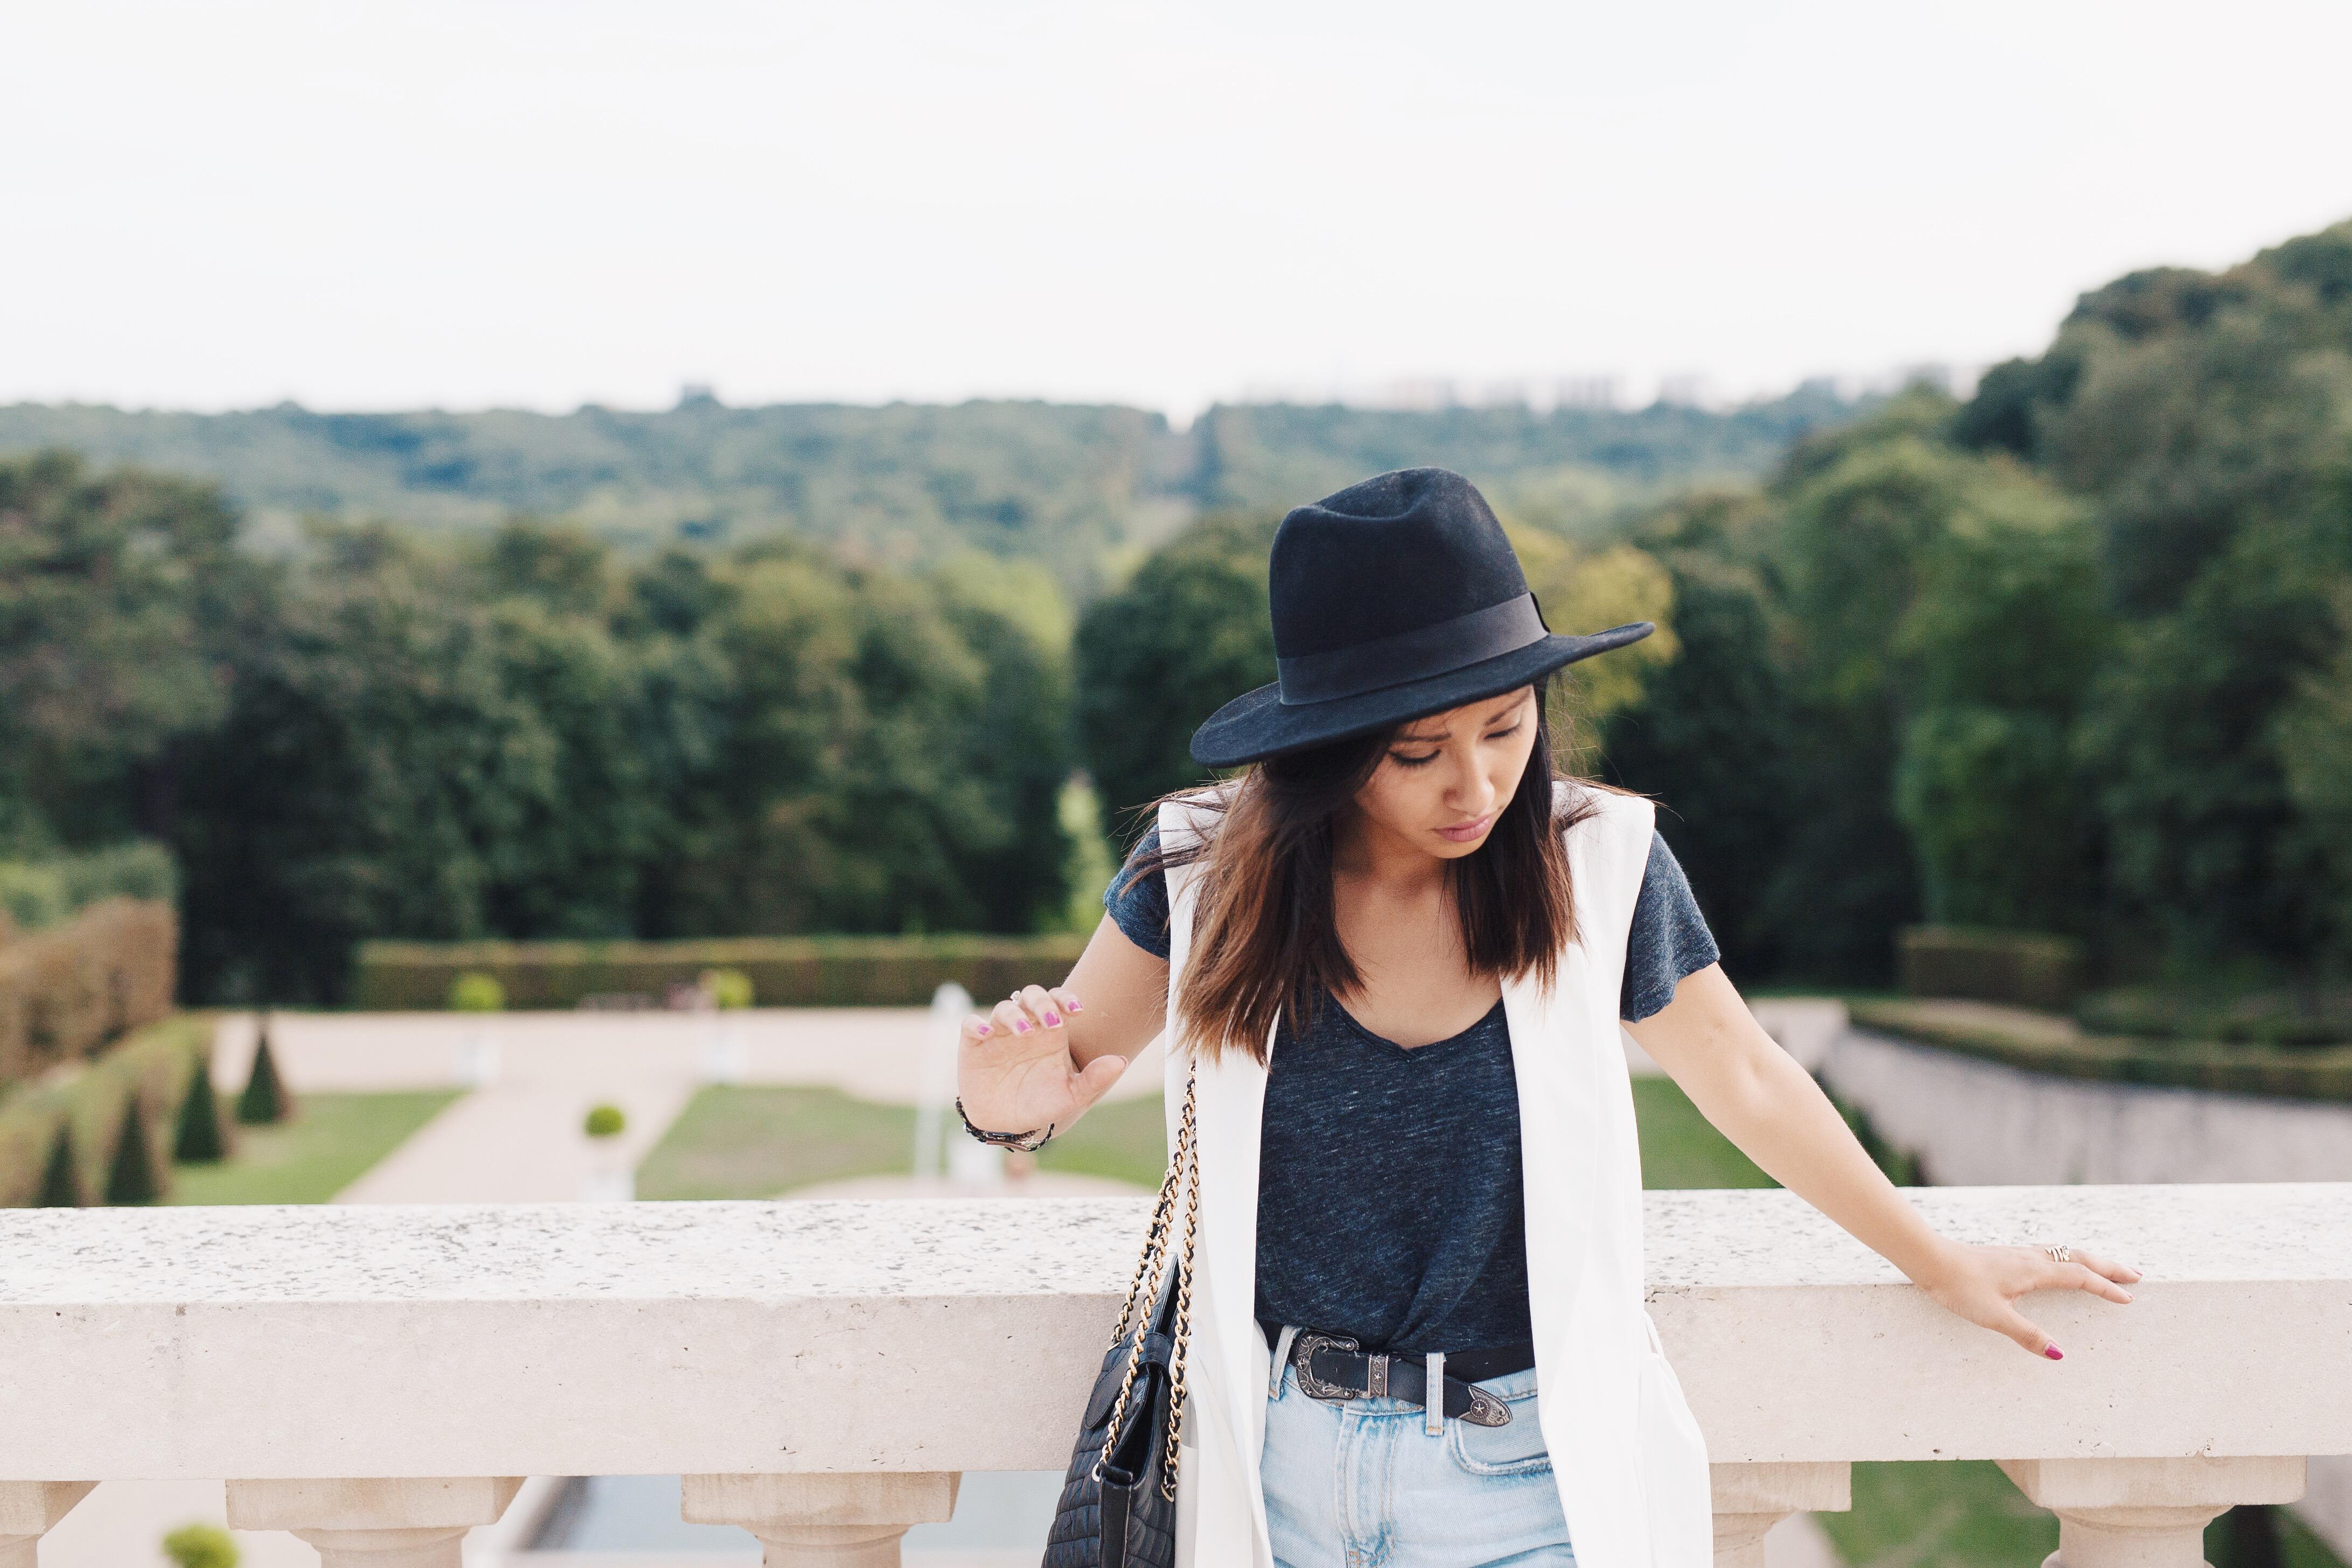 rosapelsblog fashionblog